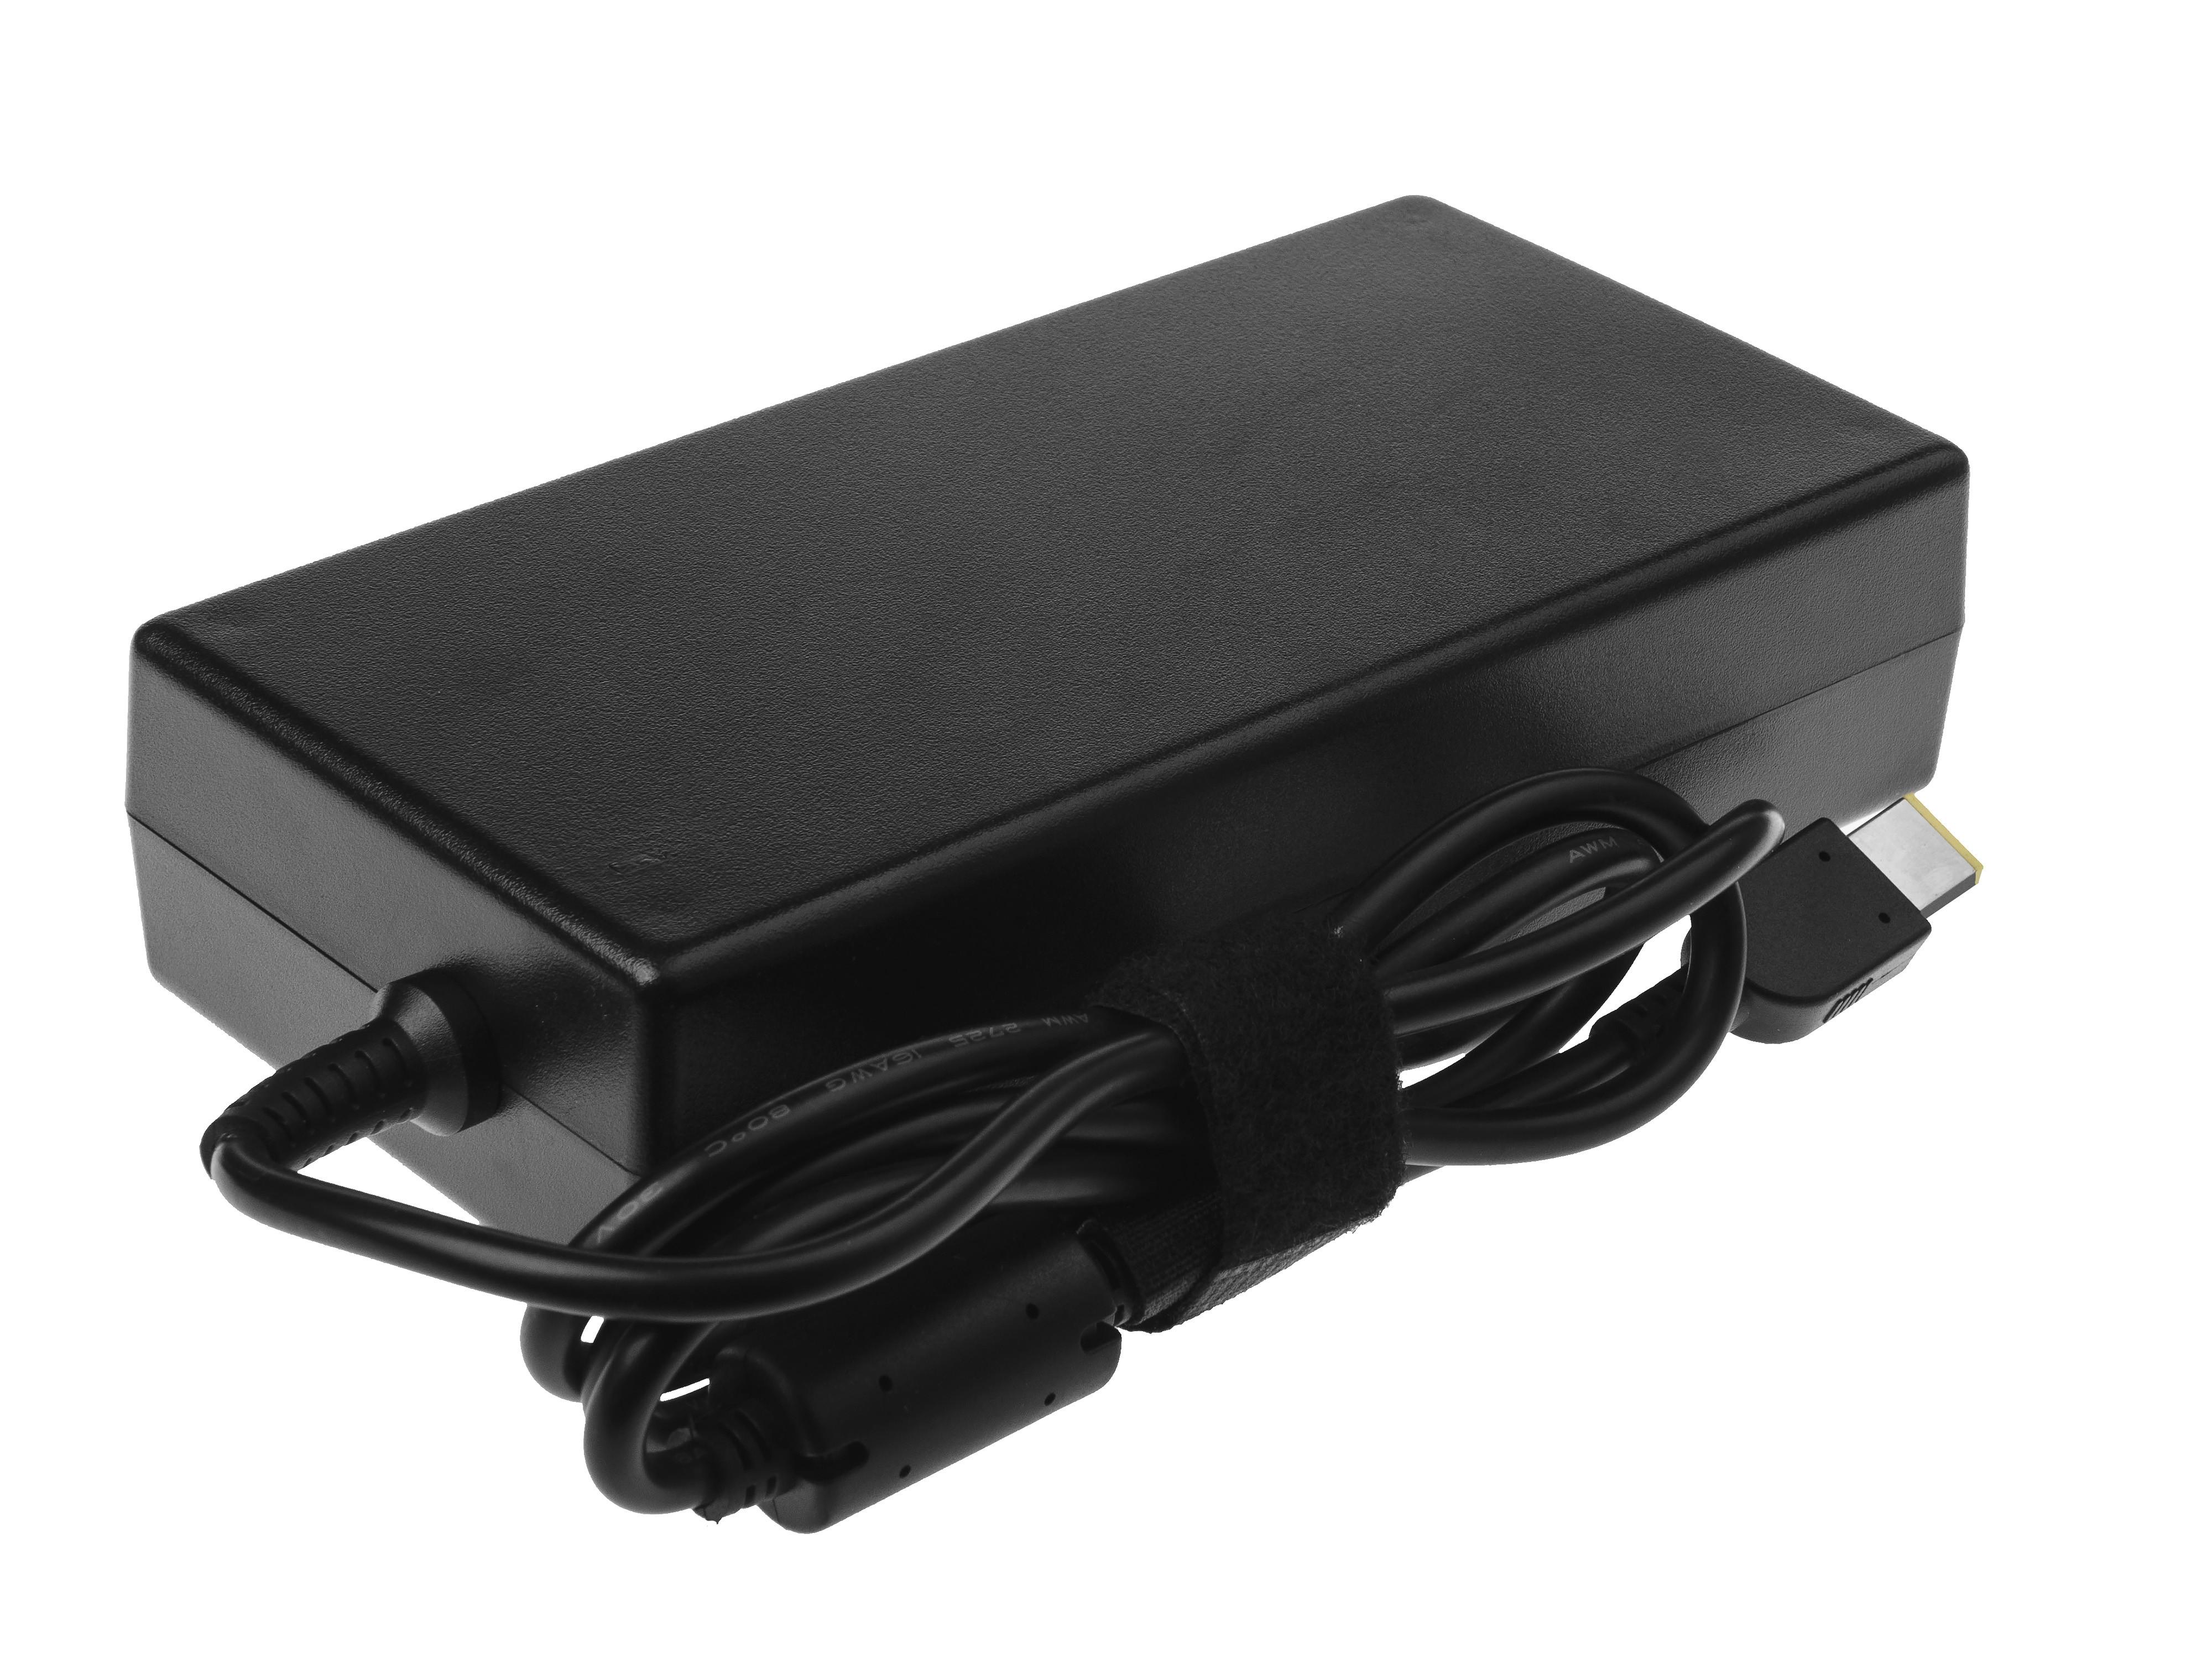 Green Cell AD117P Nabíječka Adaptér pro Lenovo ThinkPad P50 P51 P52 P70 P71 W540 W541 20V 8.5A | 170W